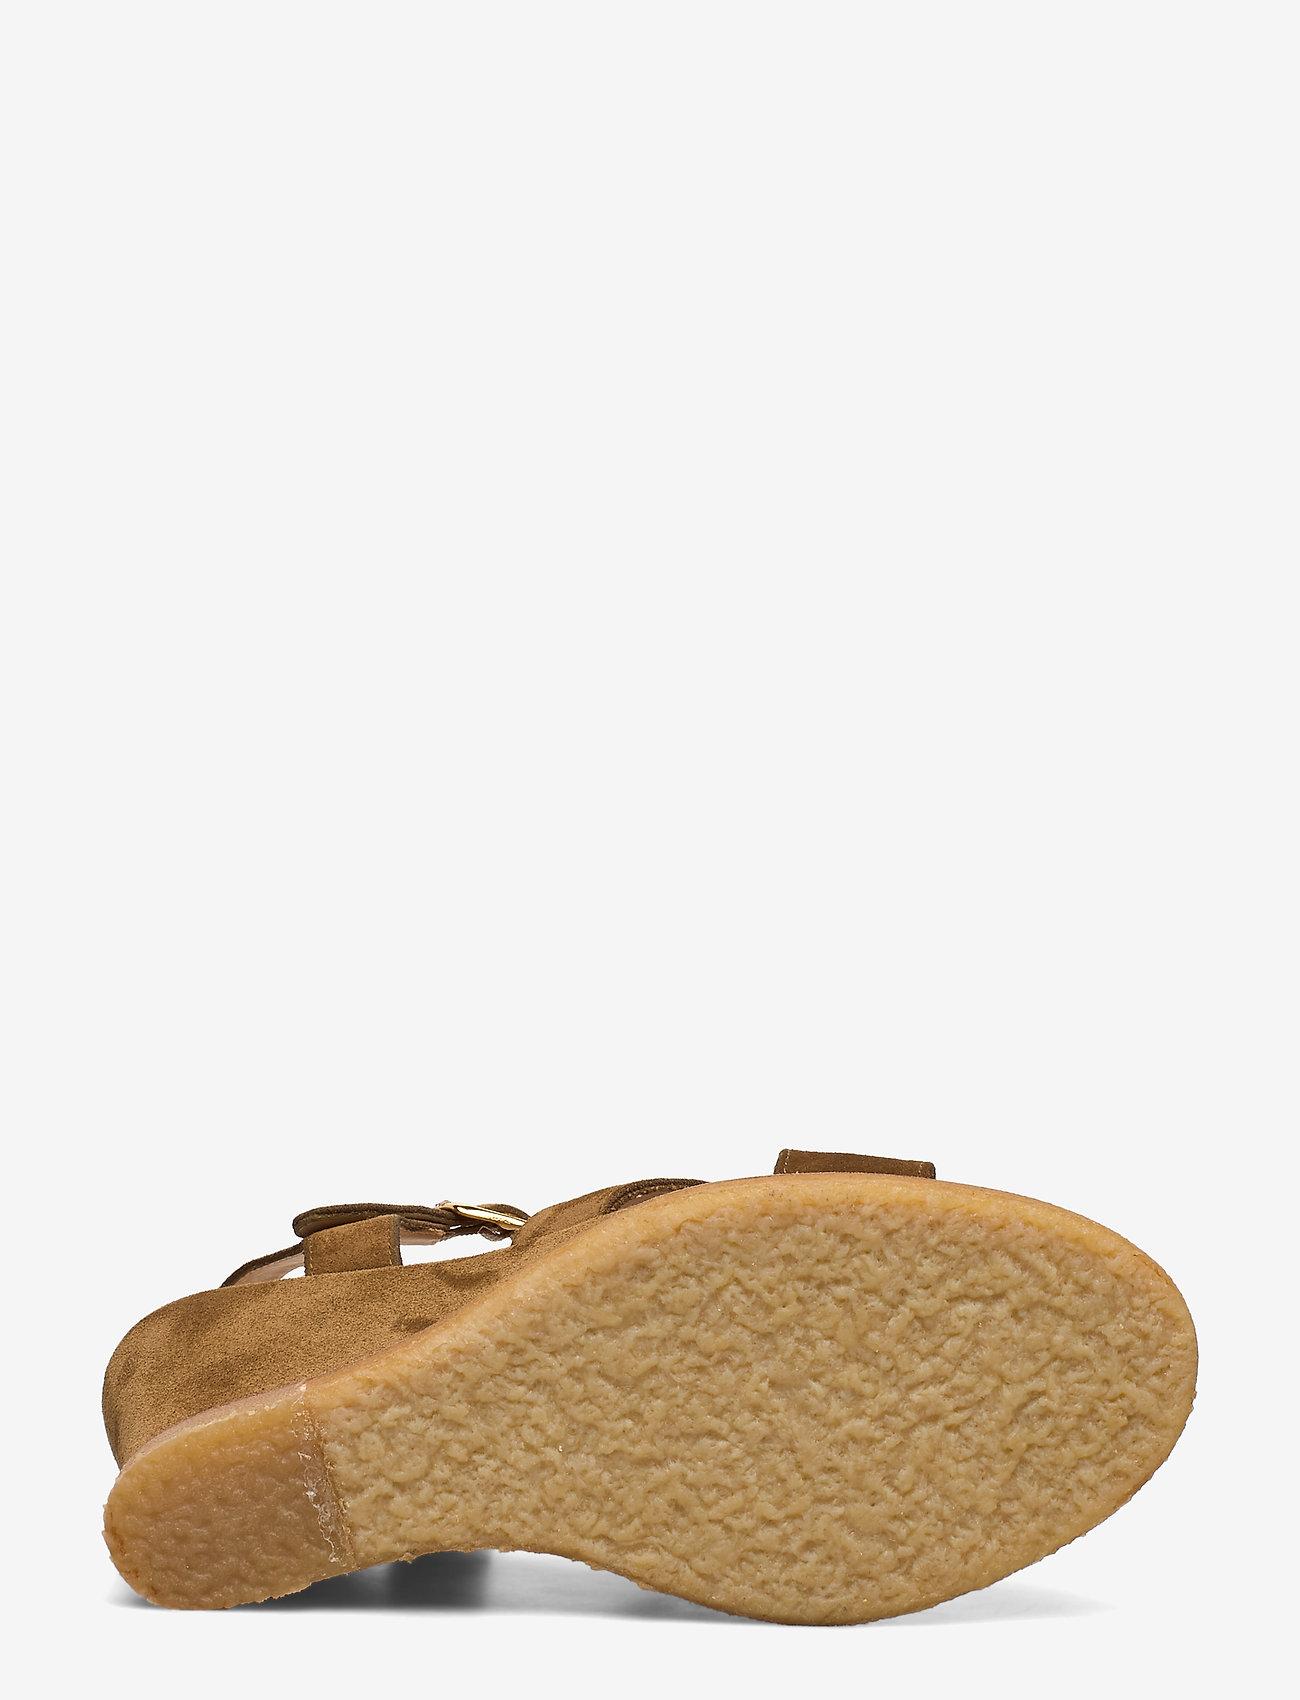 Sandals - Wedge (2209 Mustard) (120.25 €) - ANGULUS fdlPu